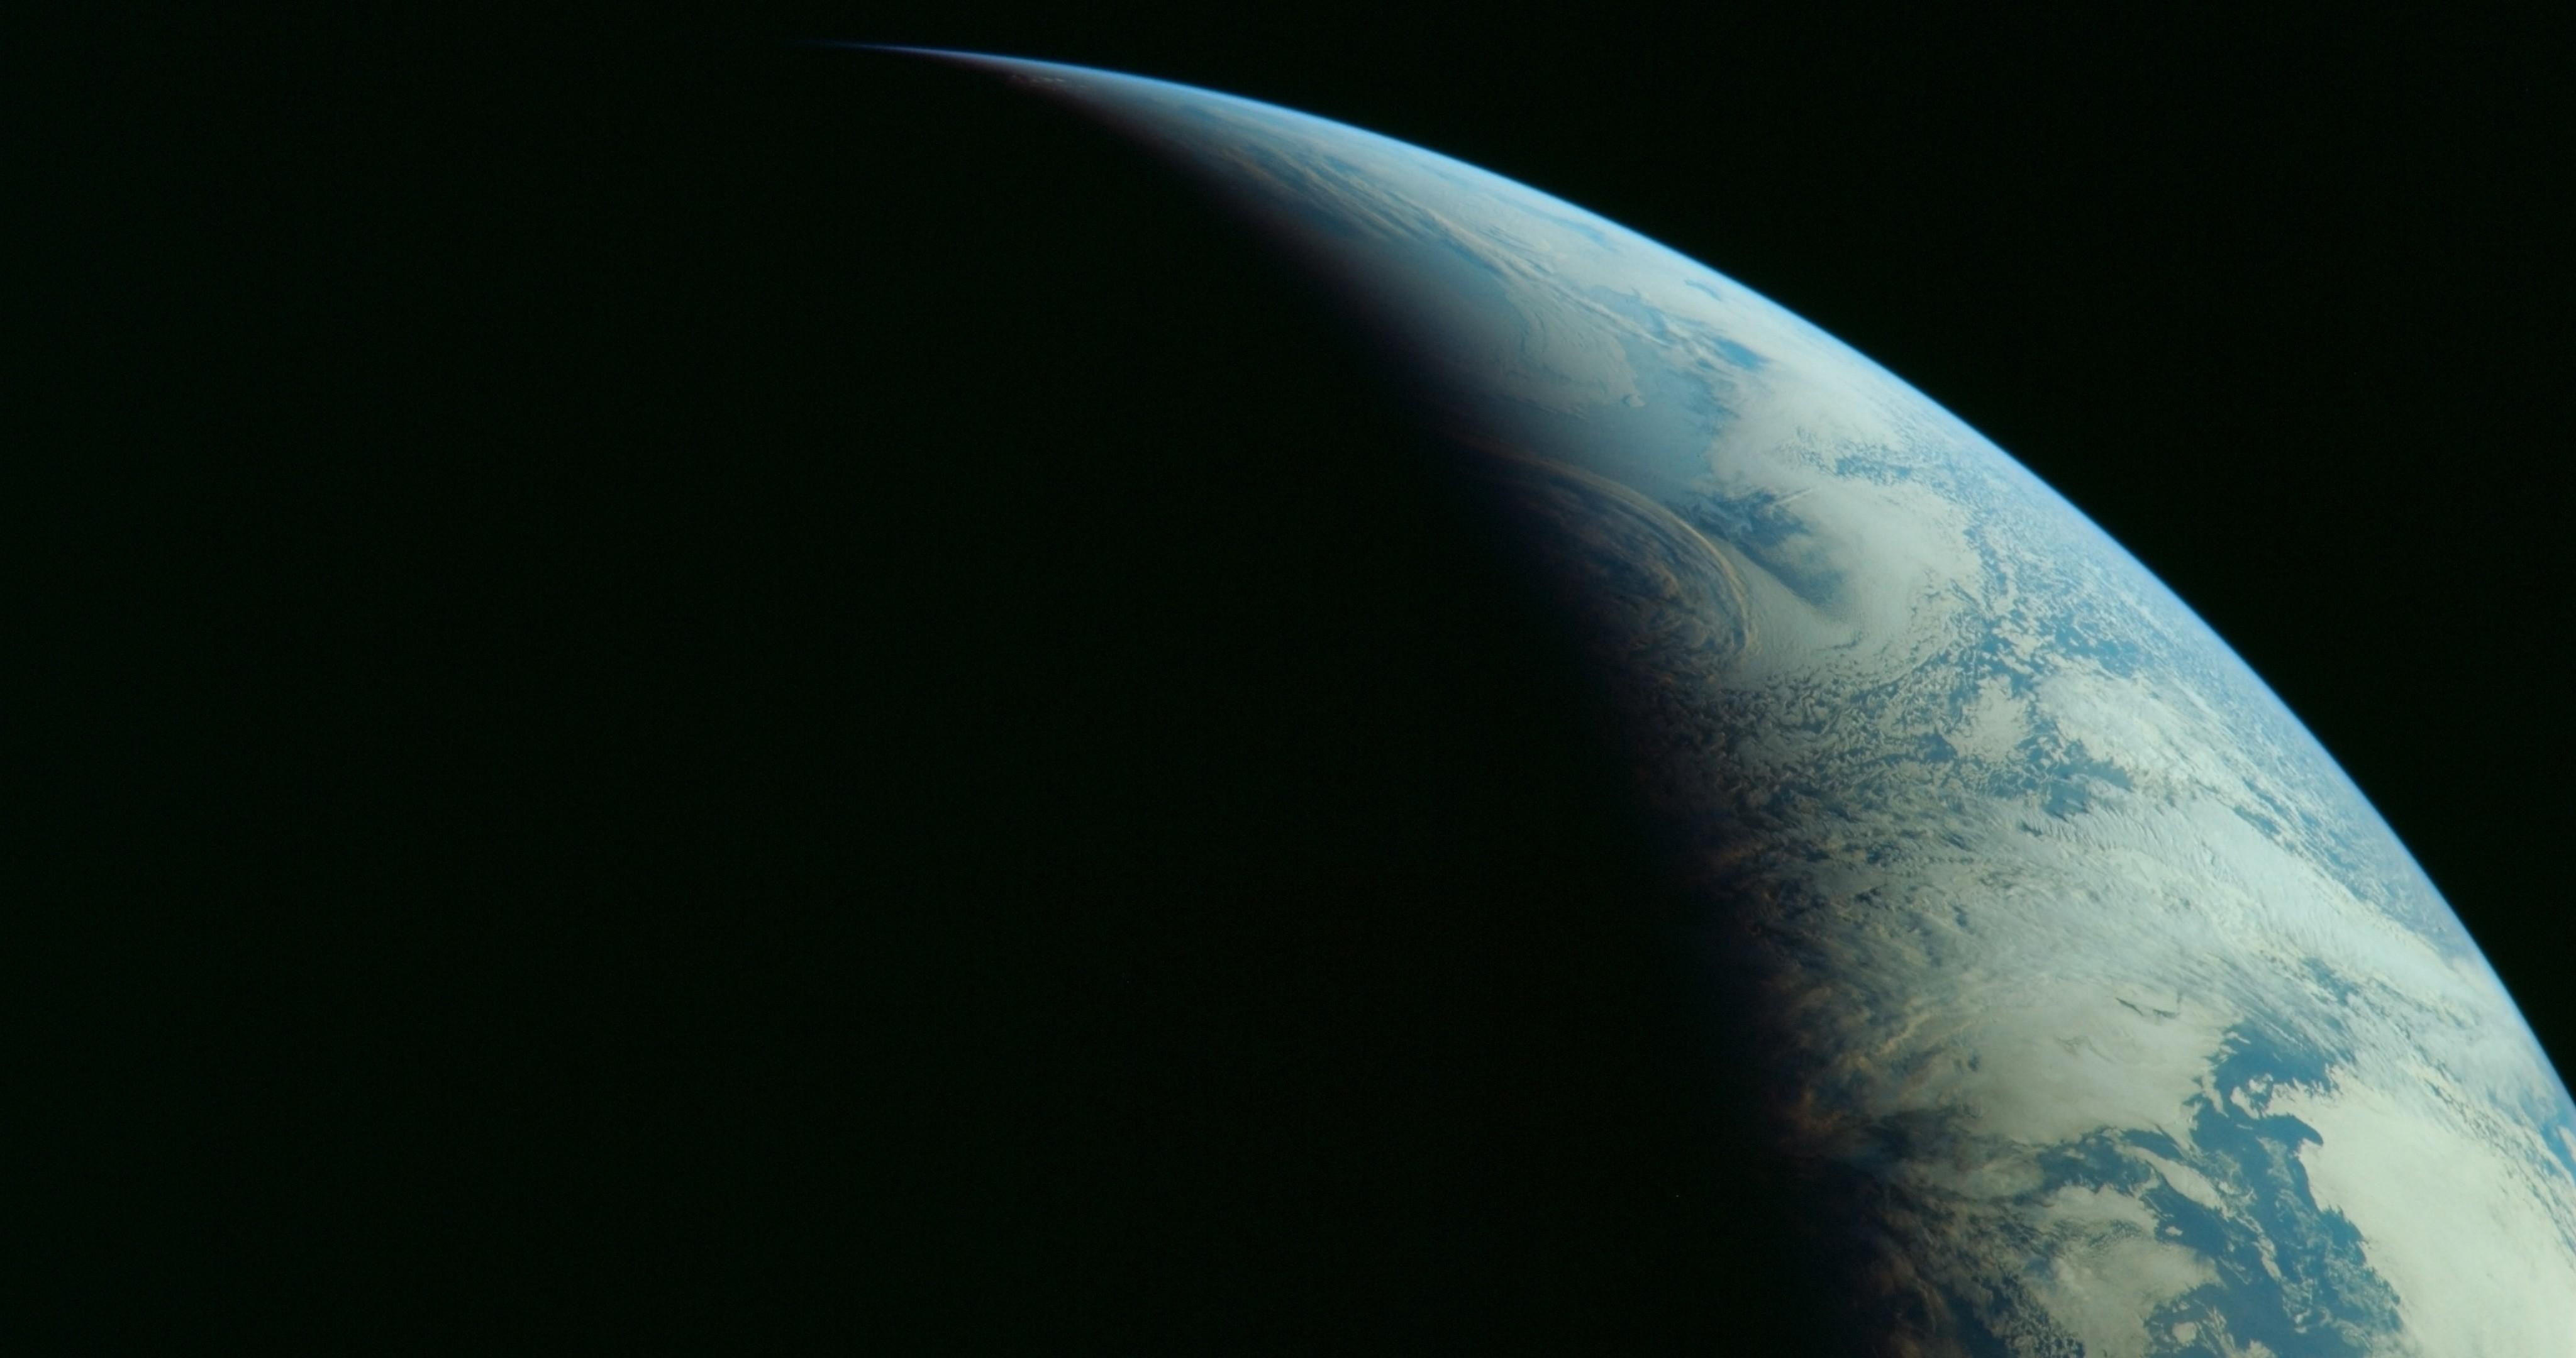 Wallpaper Planet Nasa Earth Moon Apollo Atmosphere Of